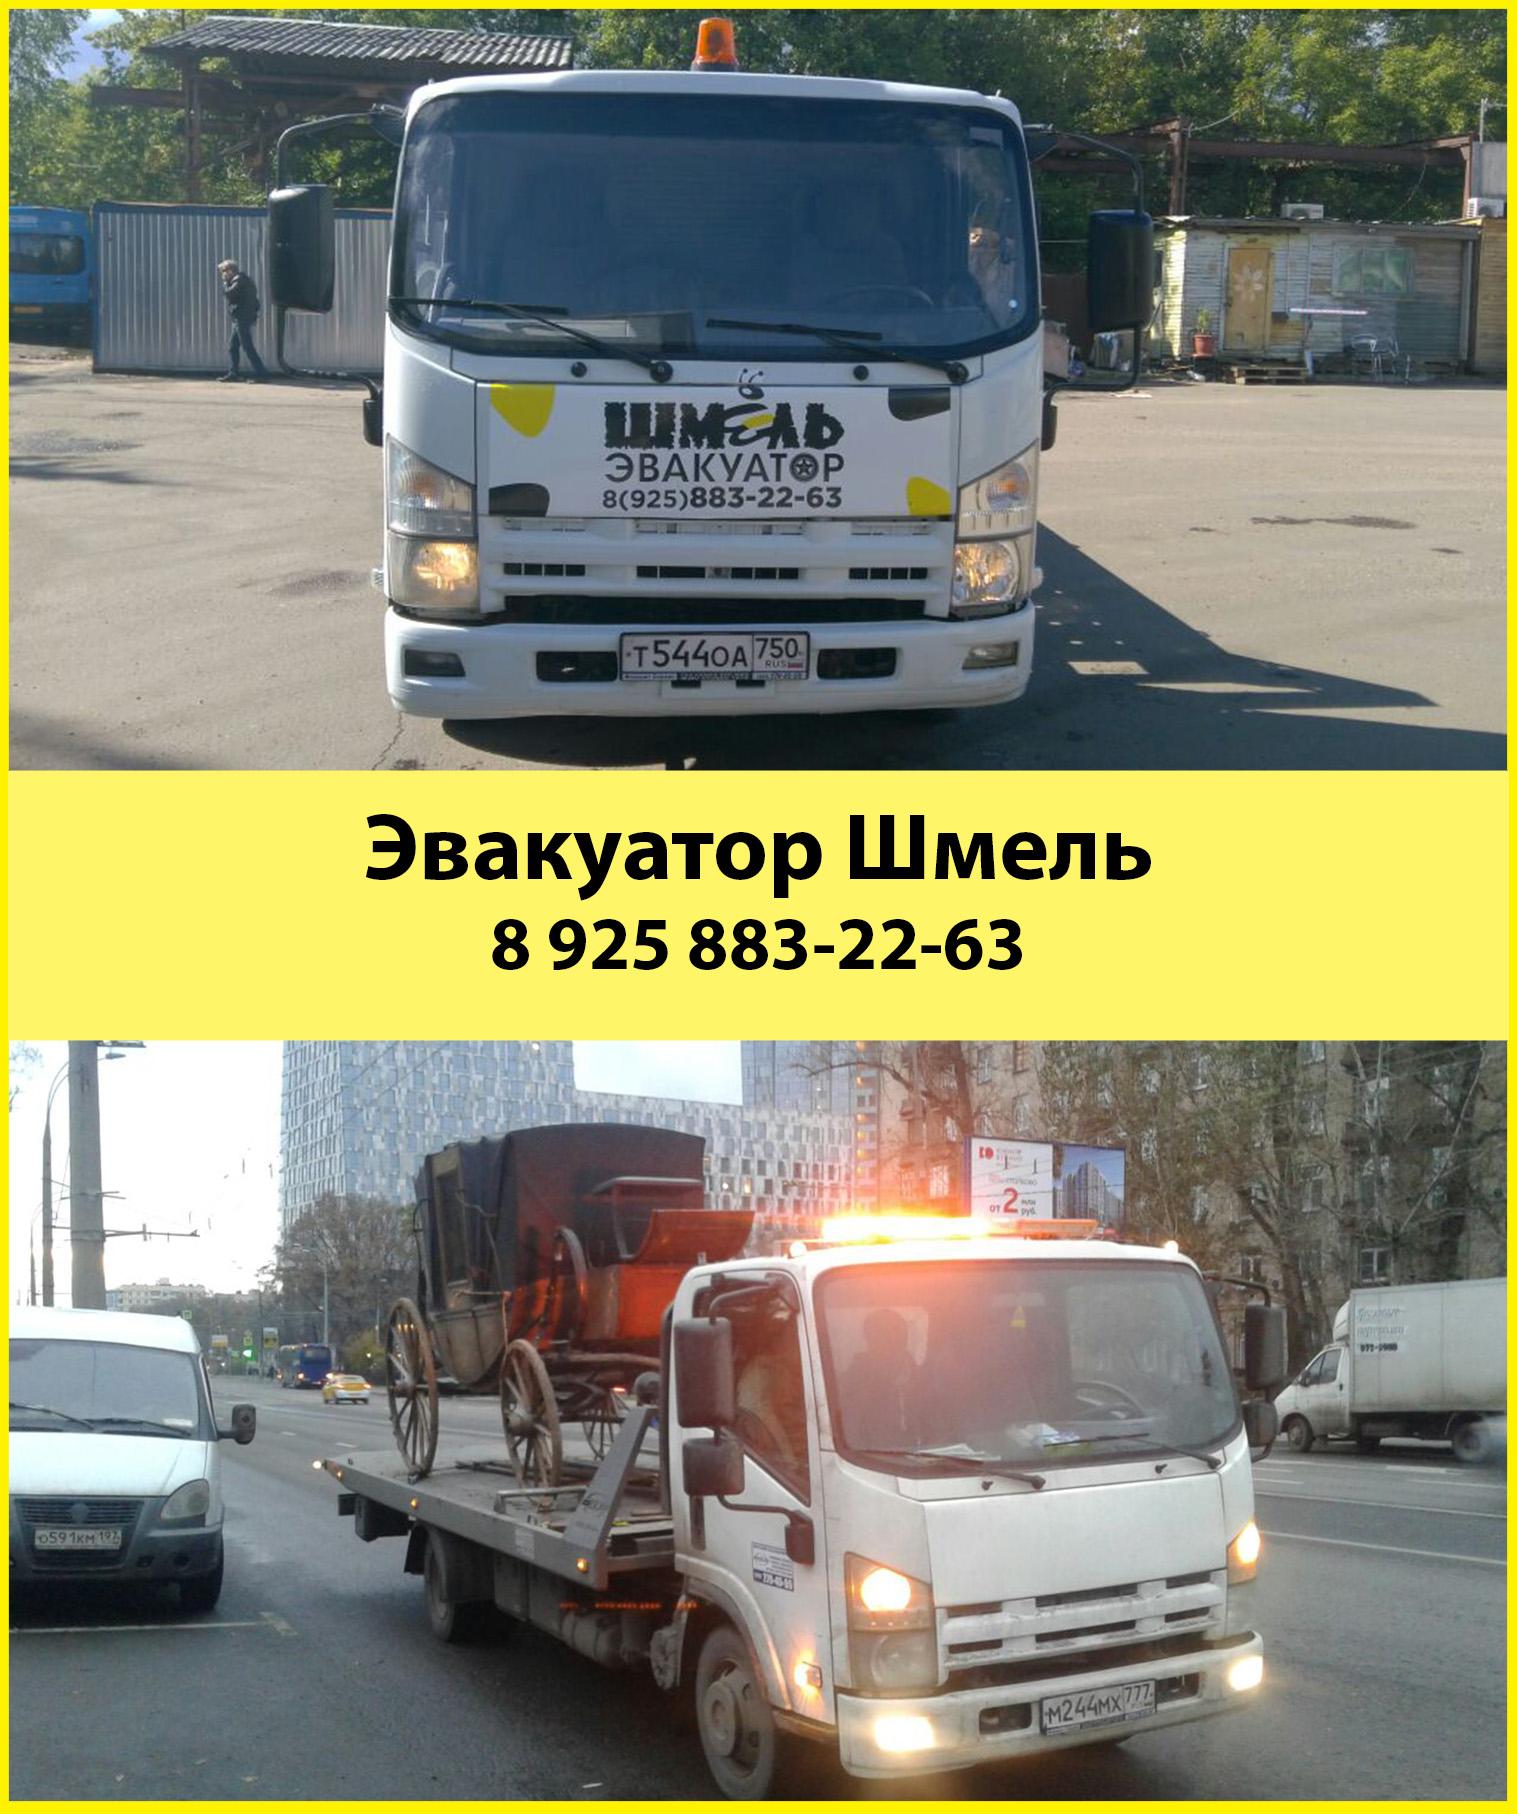 Эвакуатор Москва - Калуга